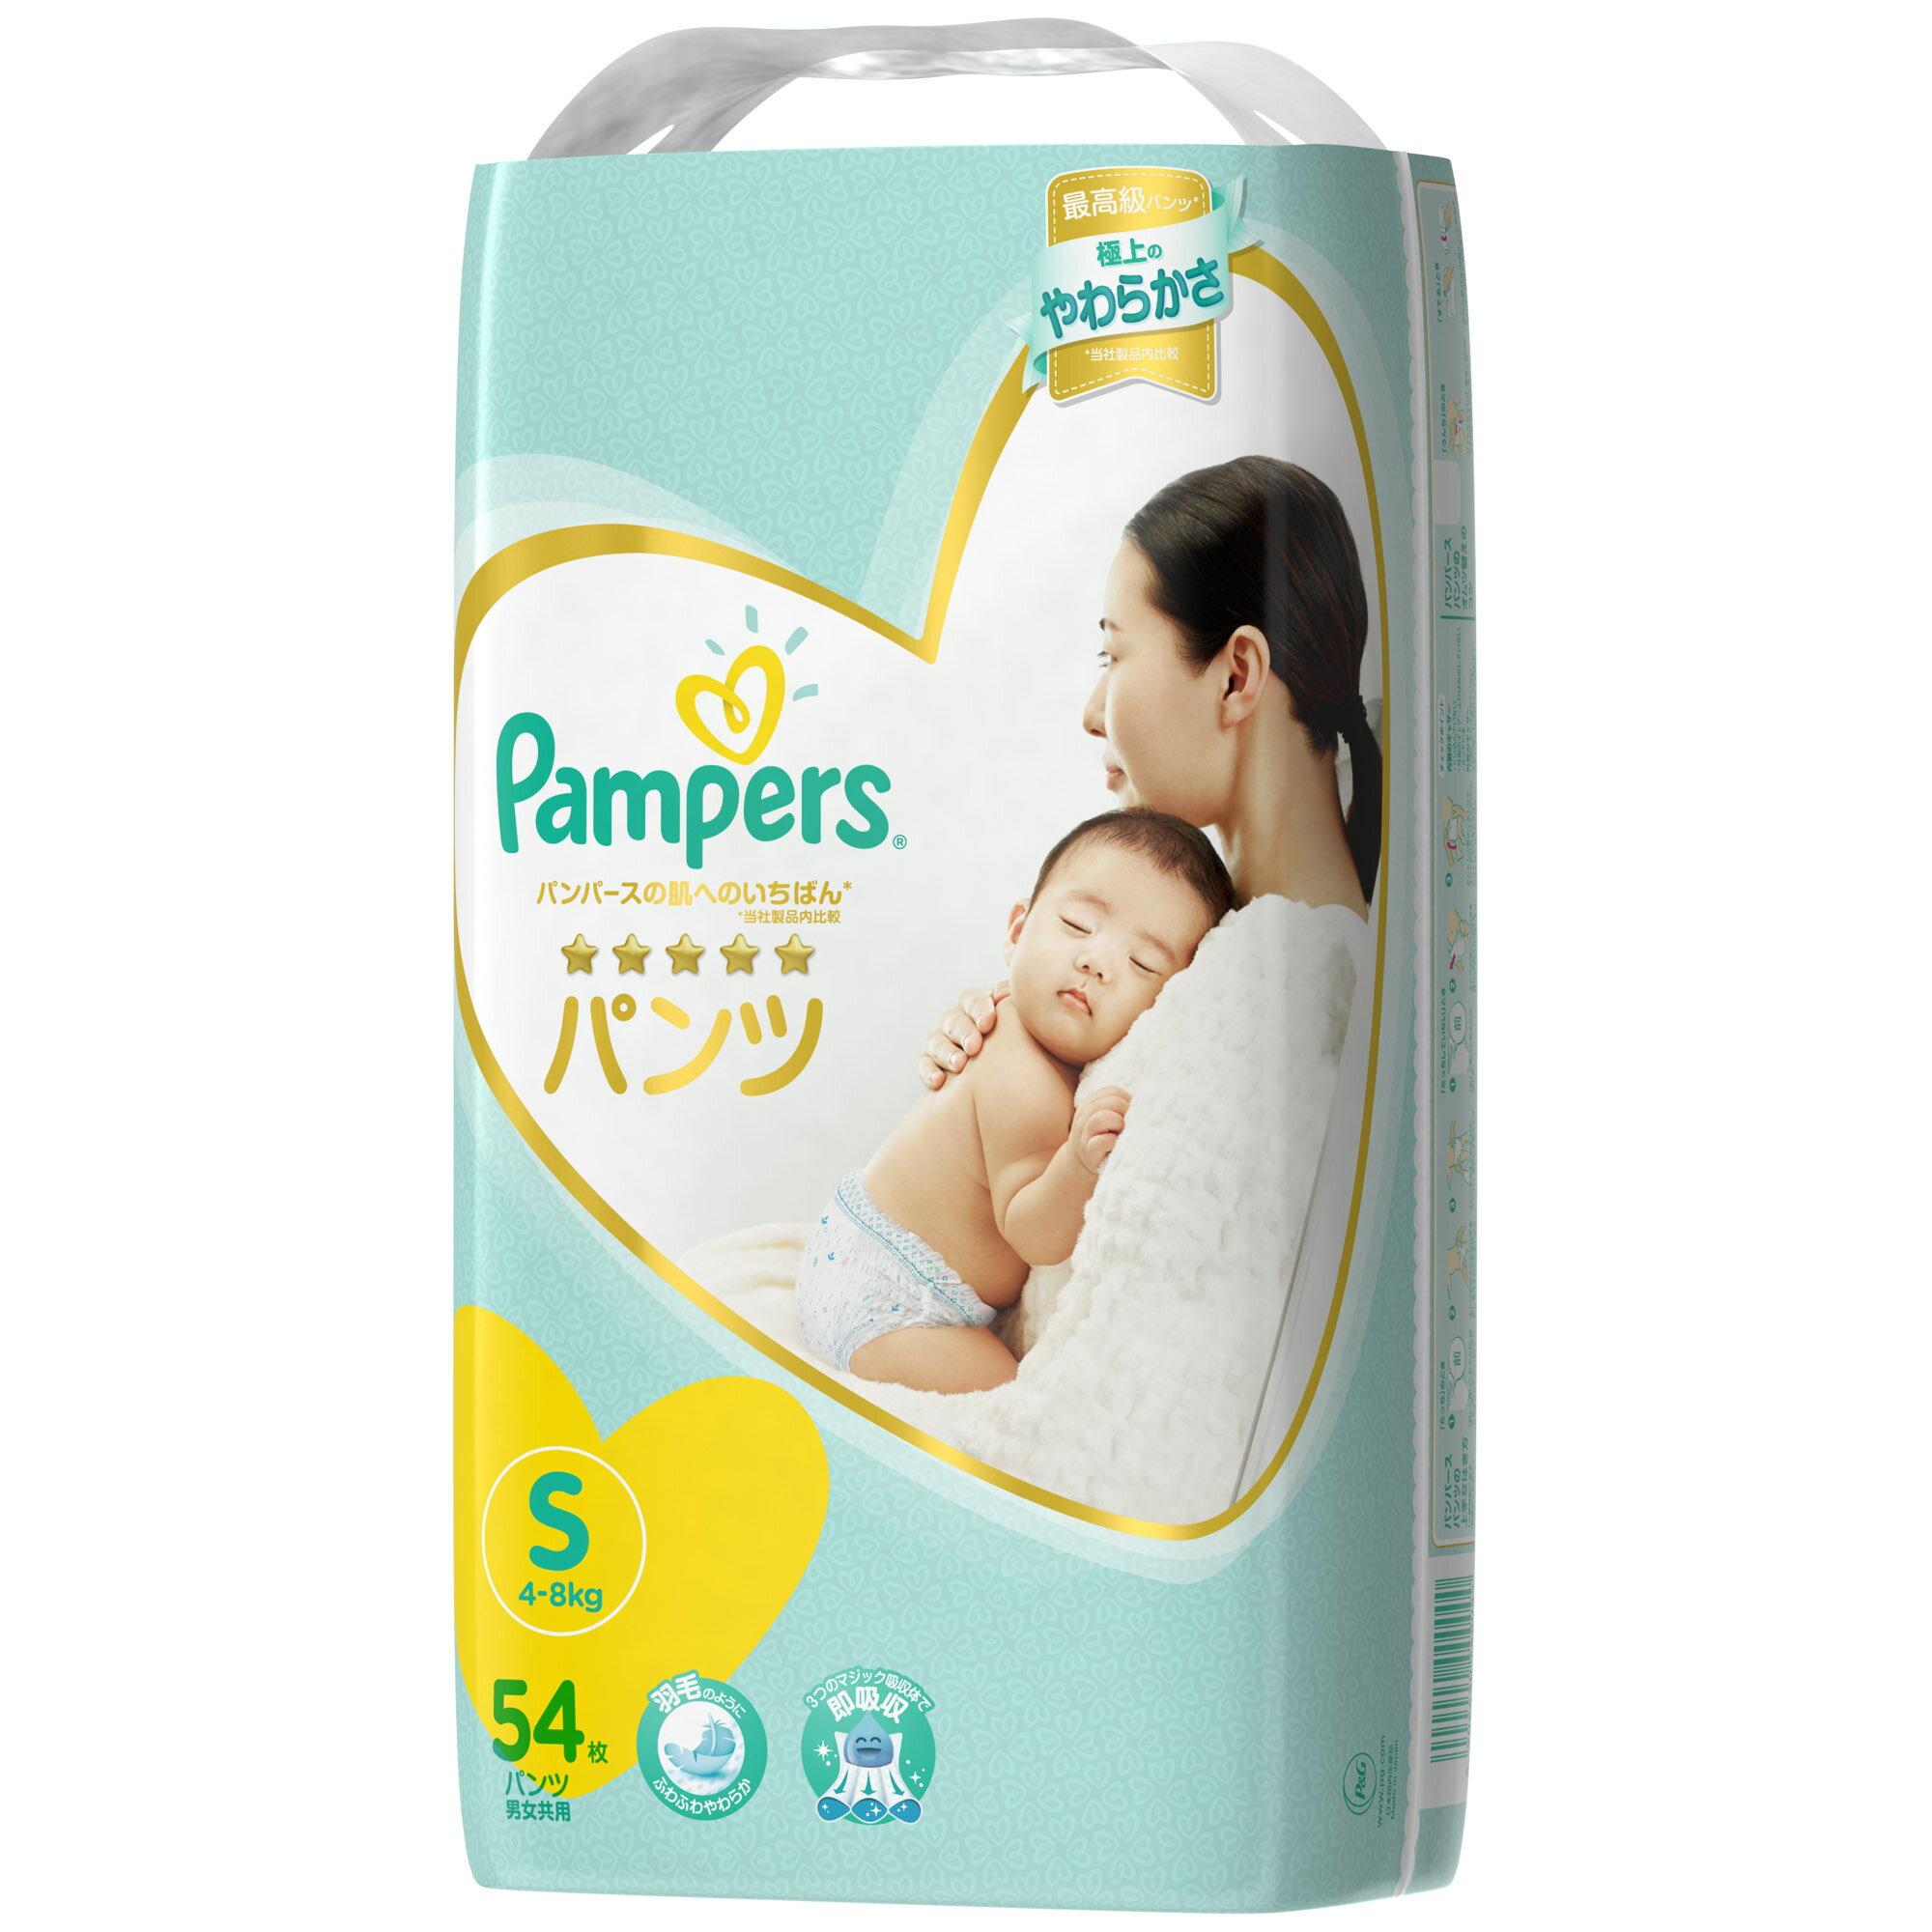 Pampers 幫寶適一級幫 拉拉褲 (S/M/L/XL) (單包入) -日本必買